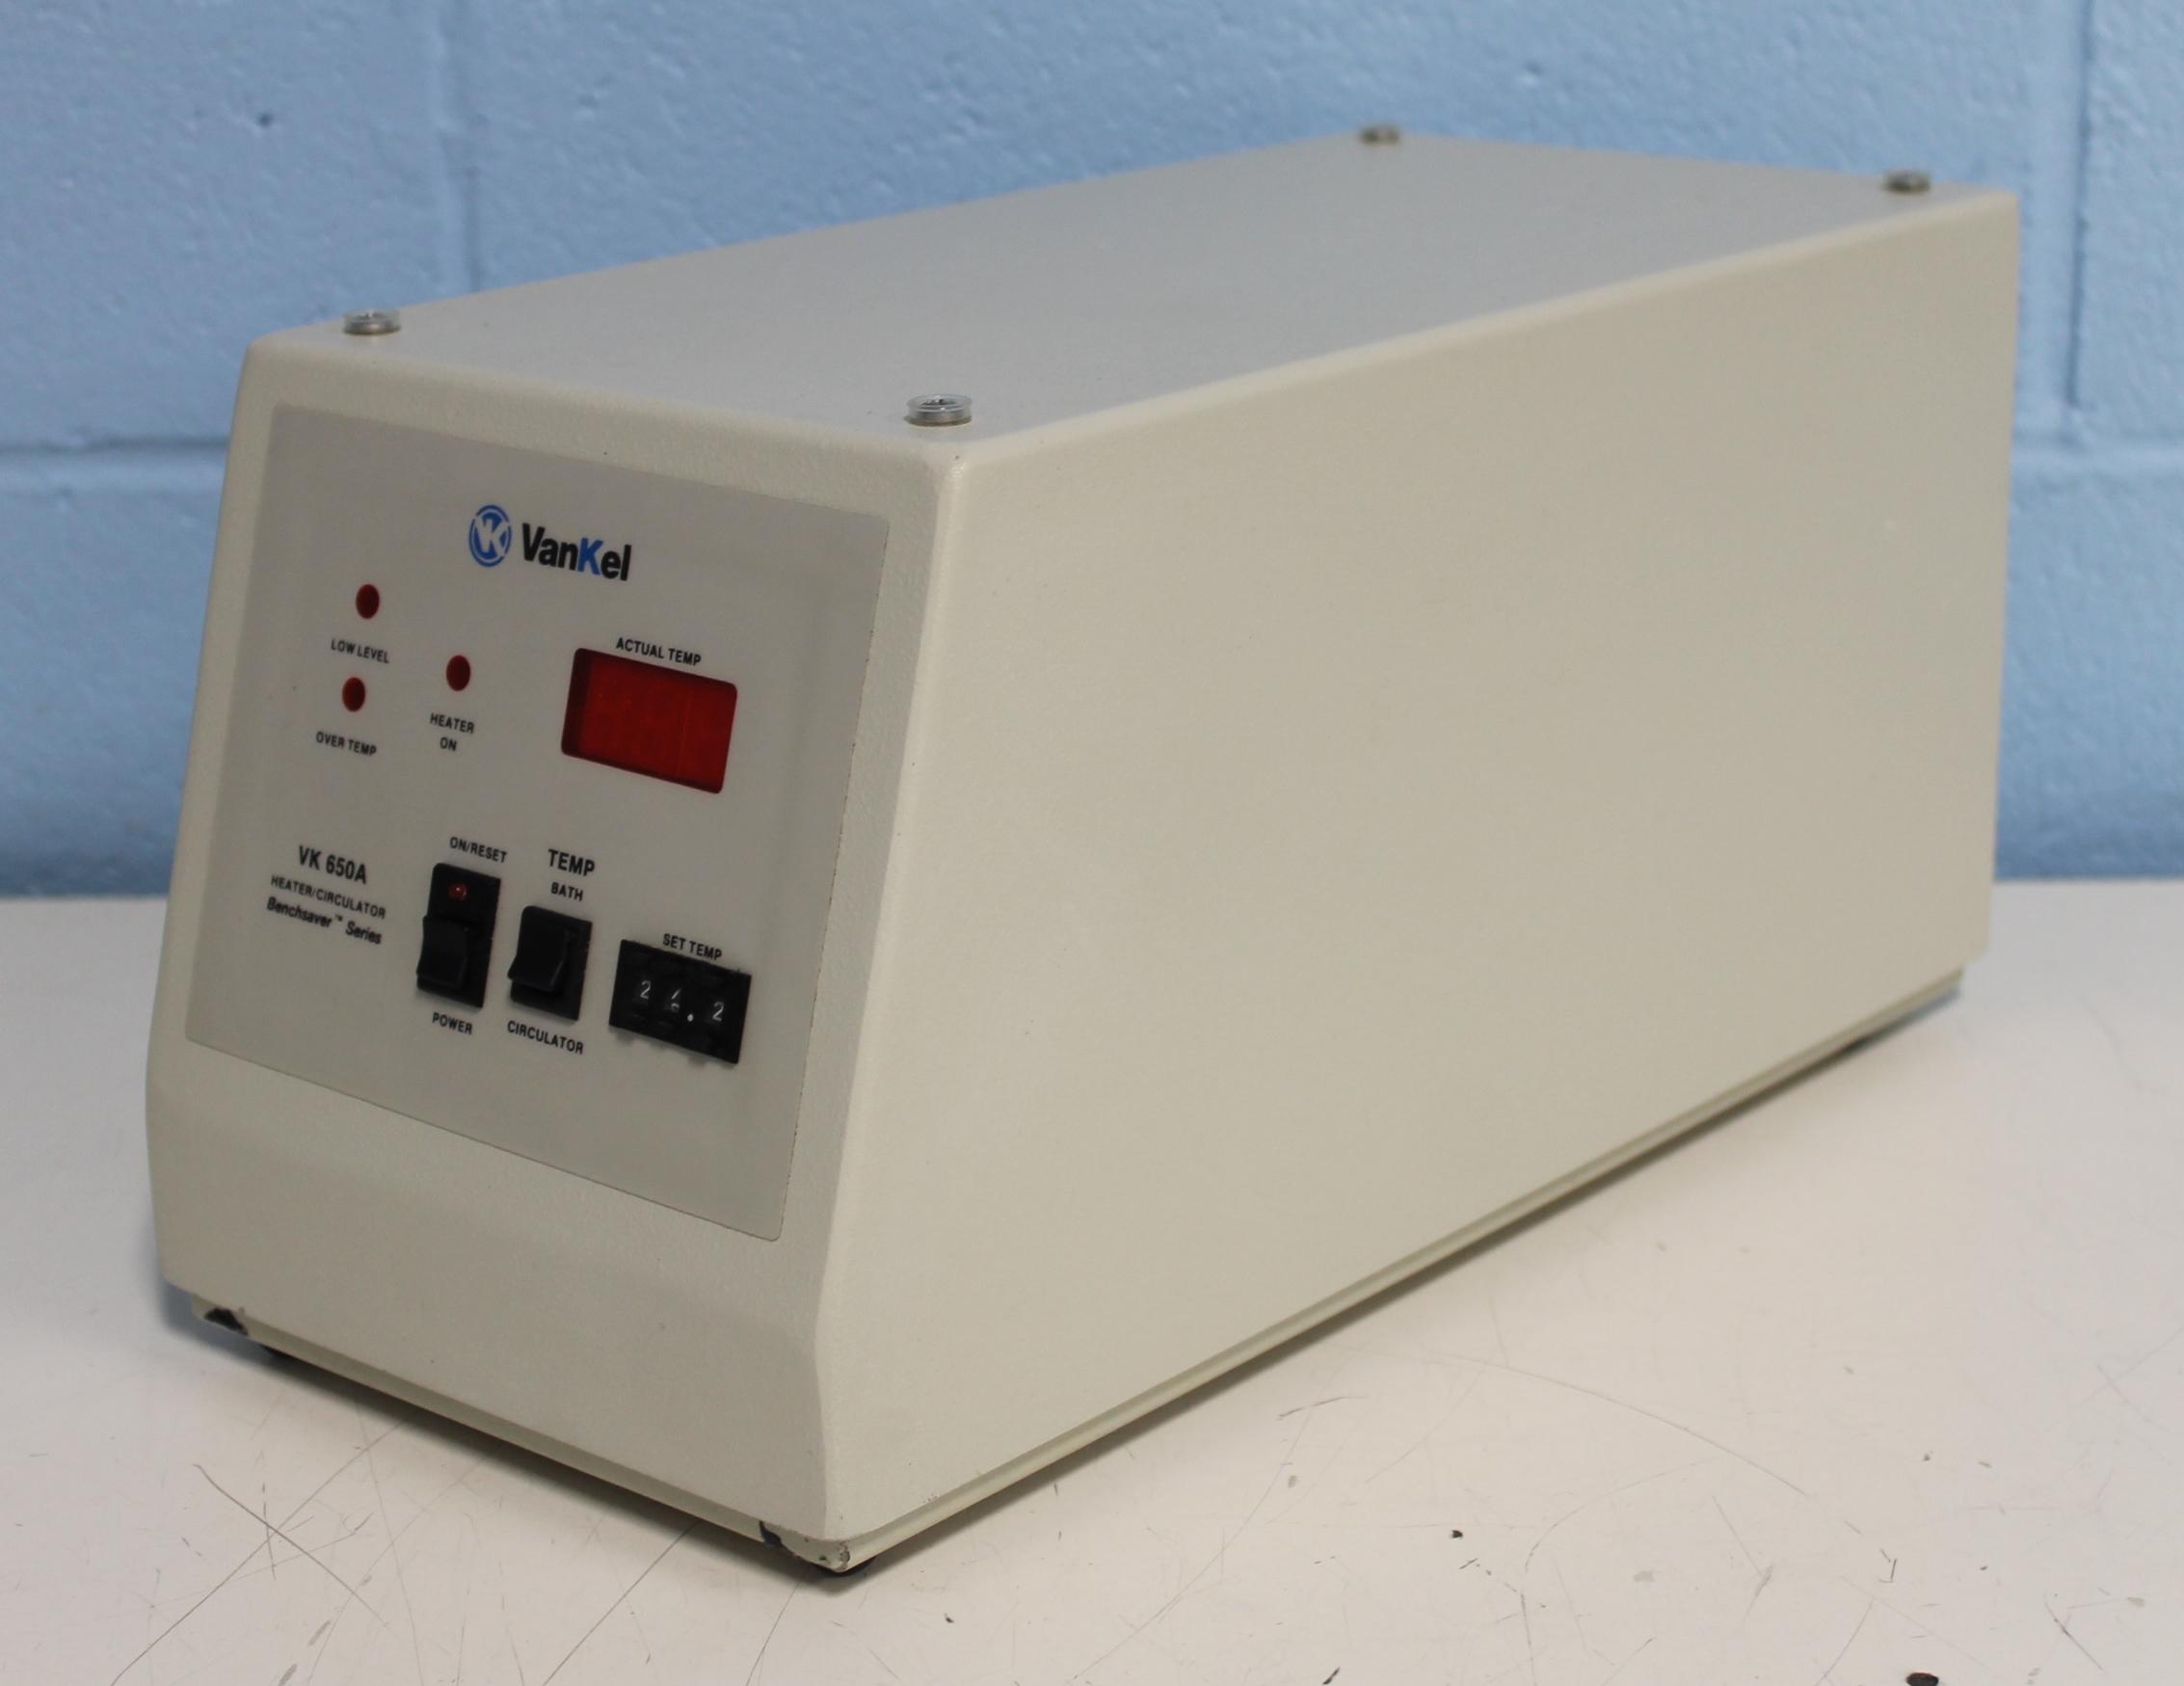 Refurbished Vankel VK 650A Heater/Circulator Benchsaver Series